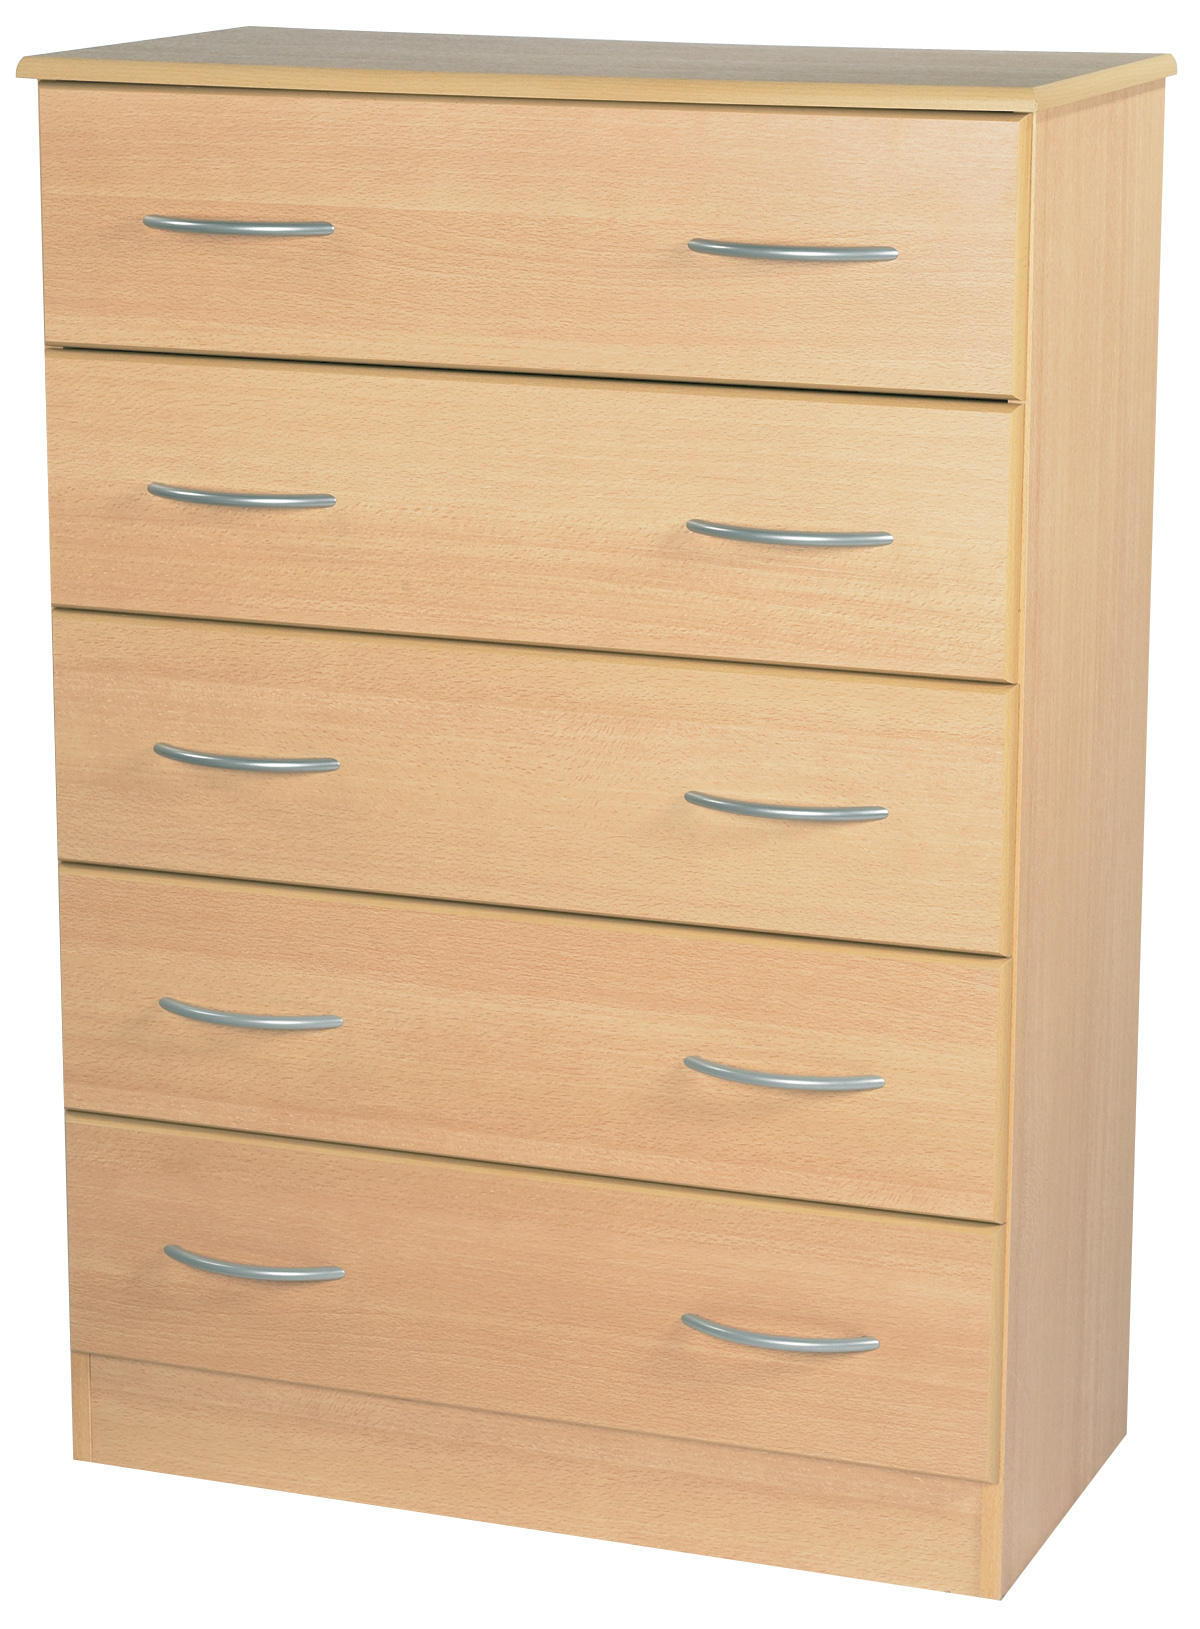 Wel e Furniture Avon 5 drawer Chest